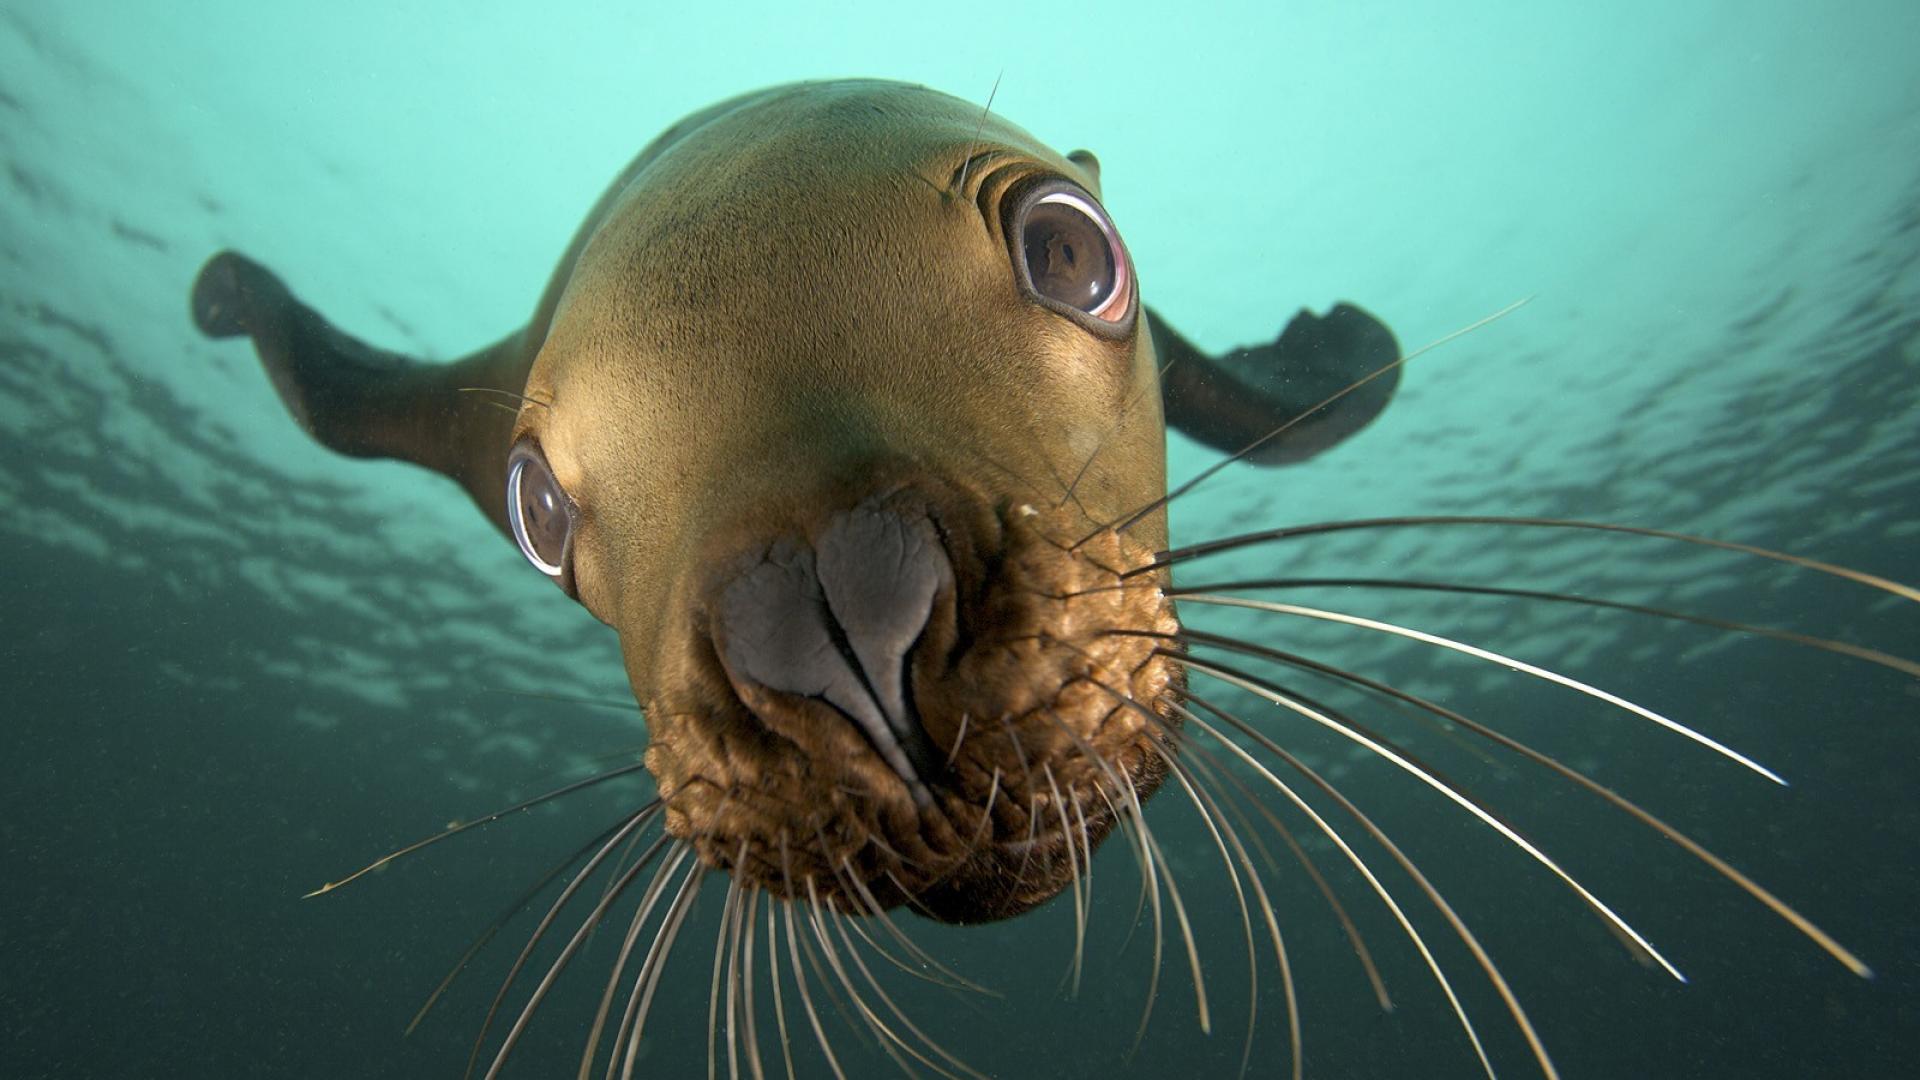 cgi british columbia sea lions underwater view wallpaper 24130 1920x1080